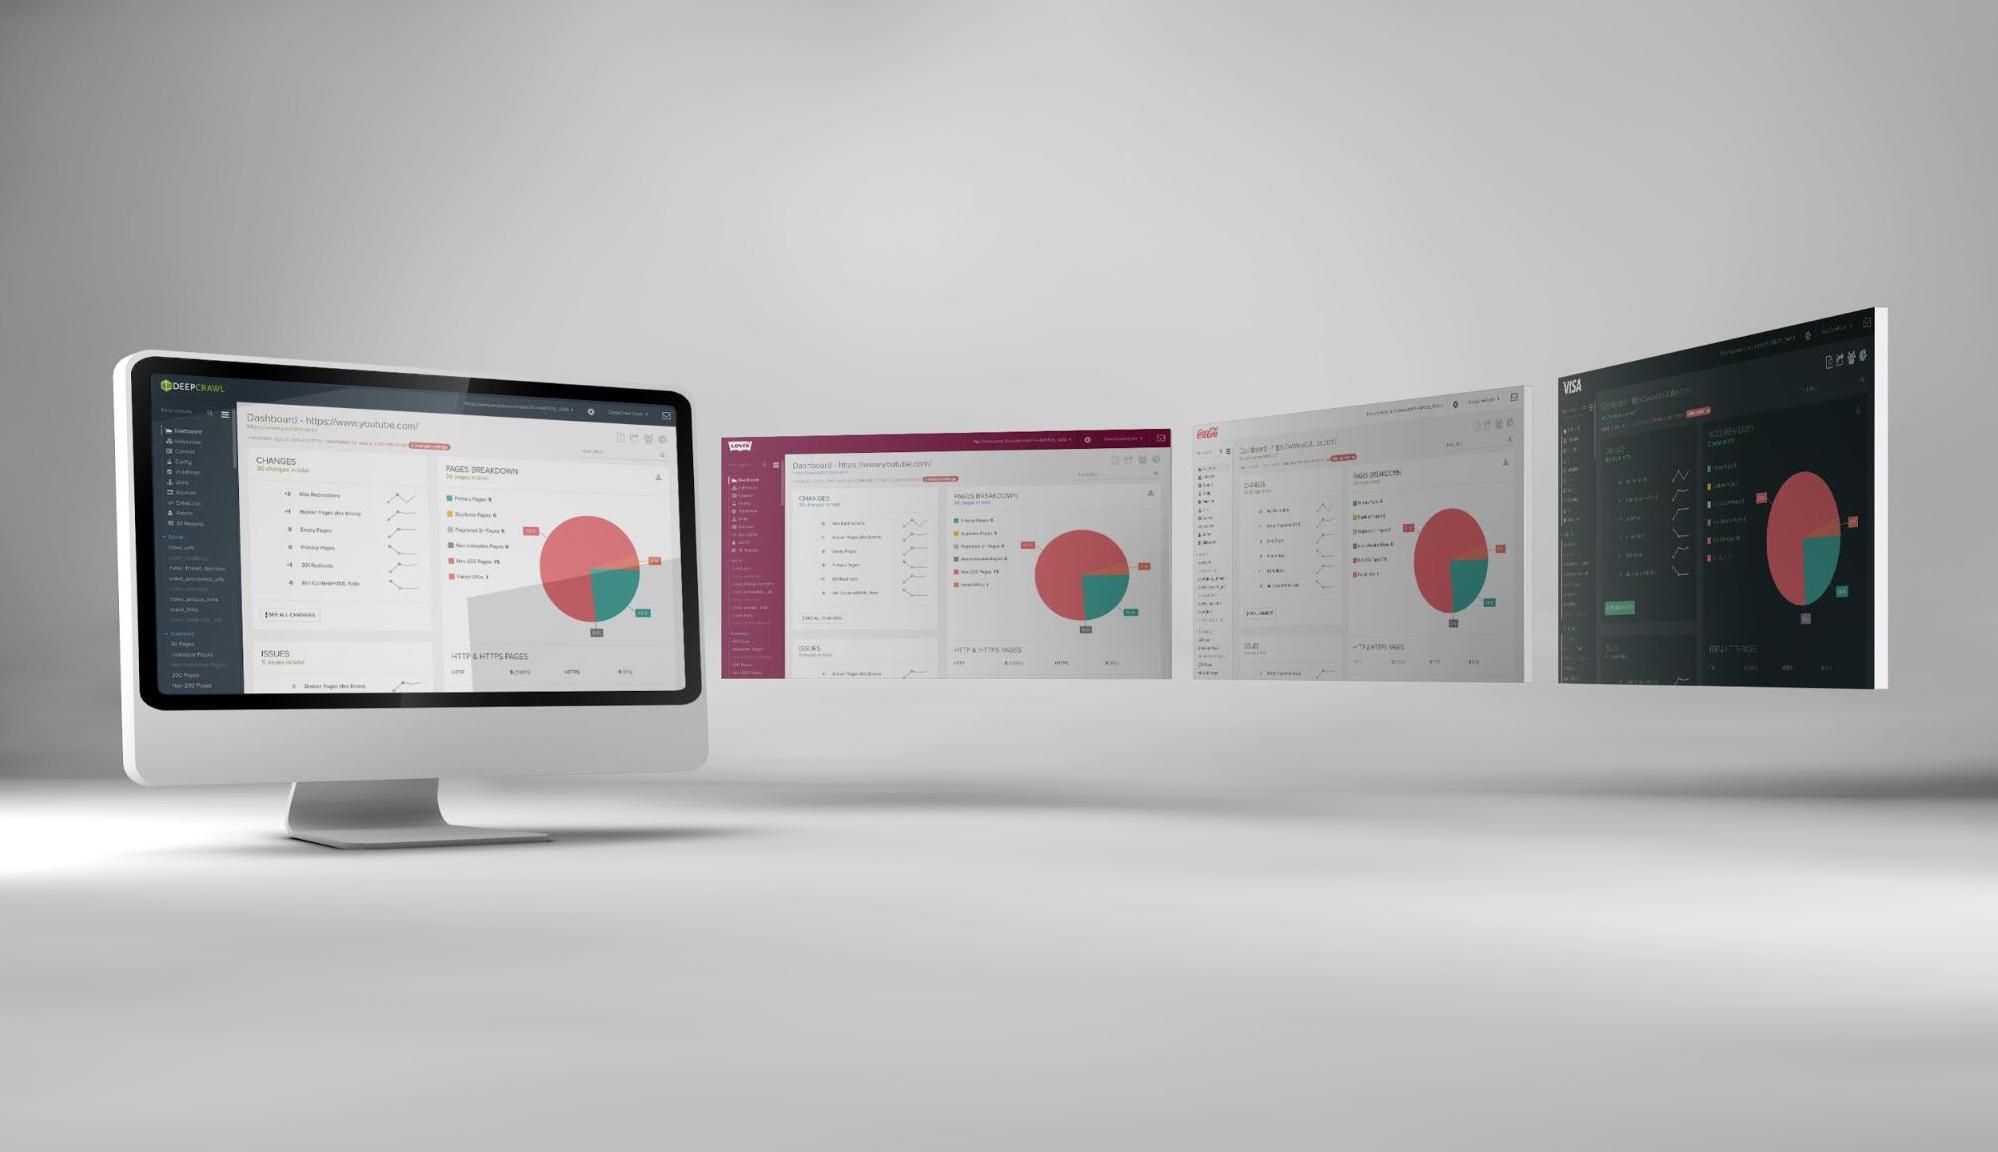 Screens showing DeepCrawl dashboards